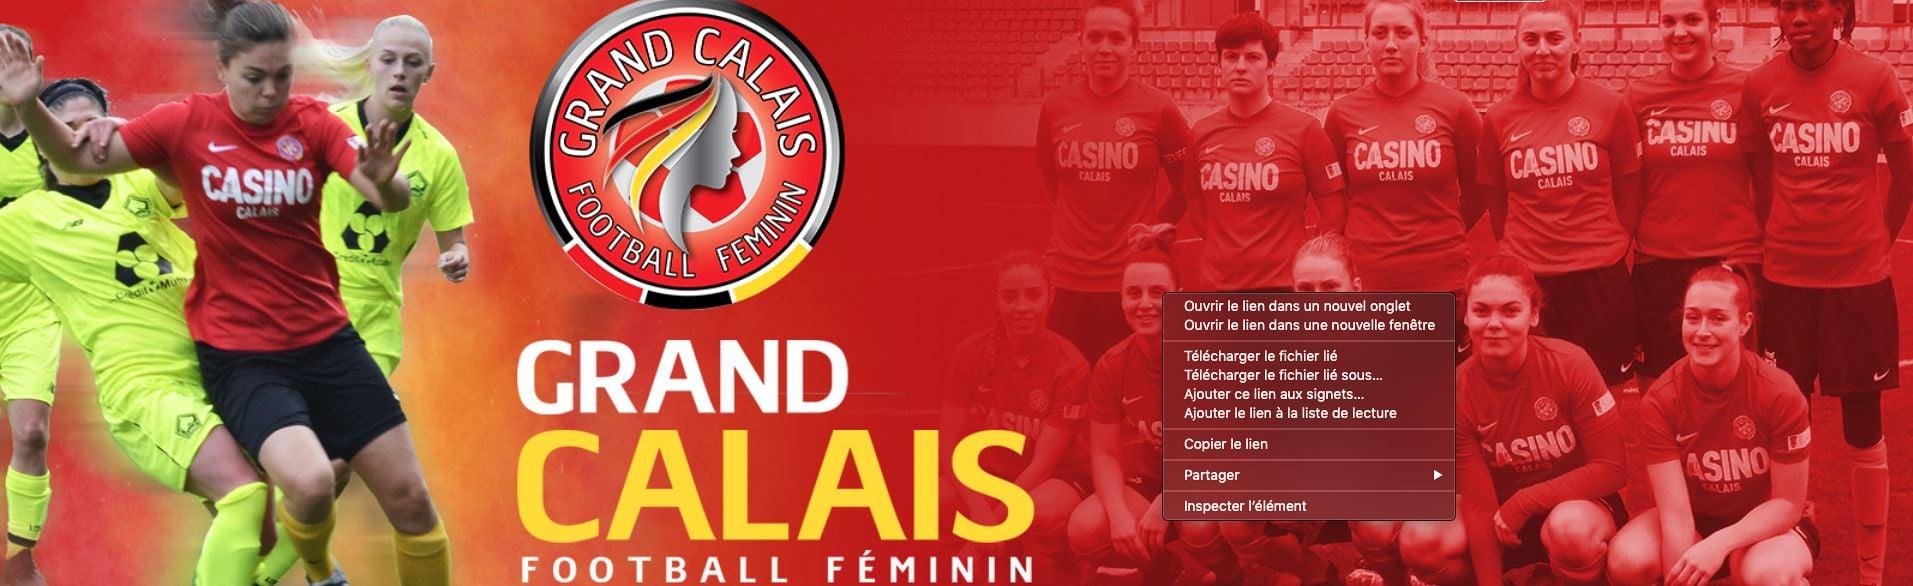 Grand Calais Football Feminin